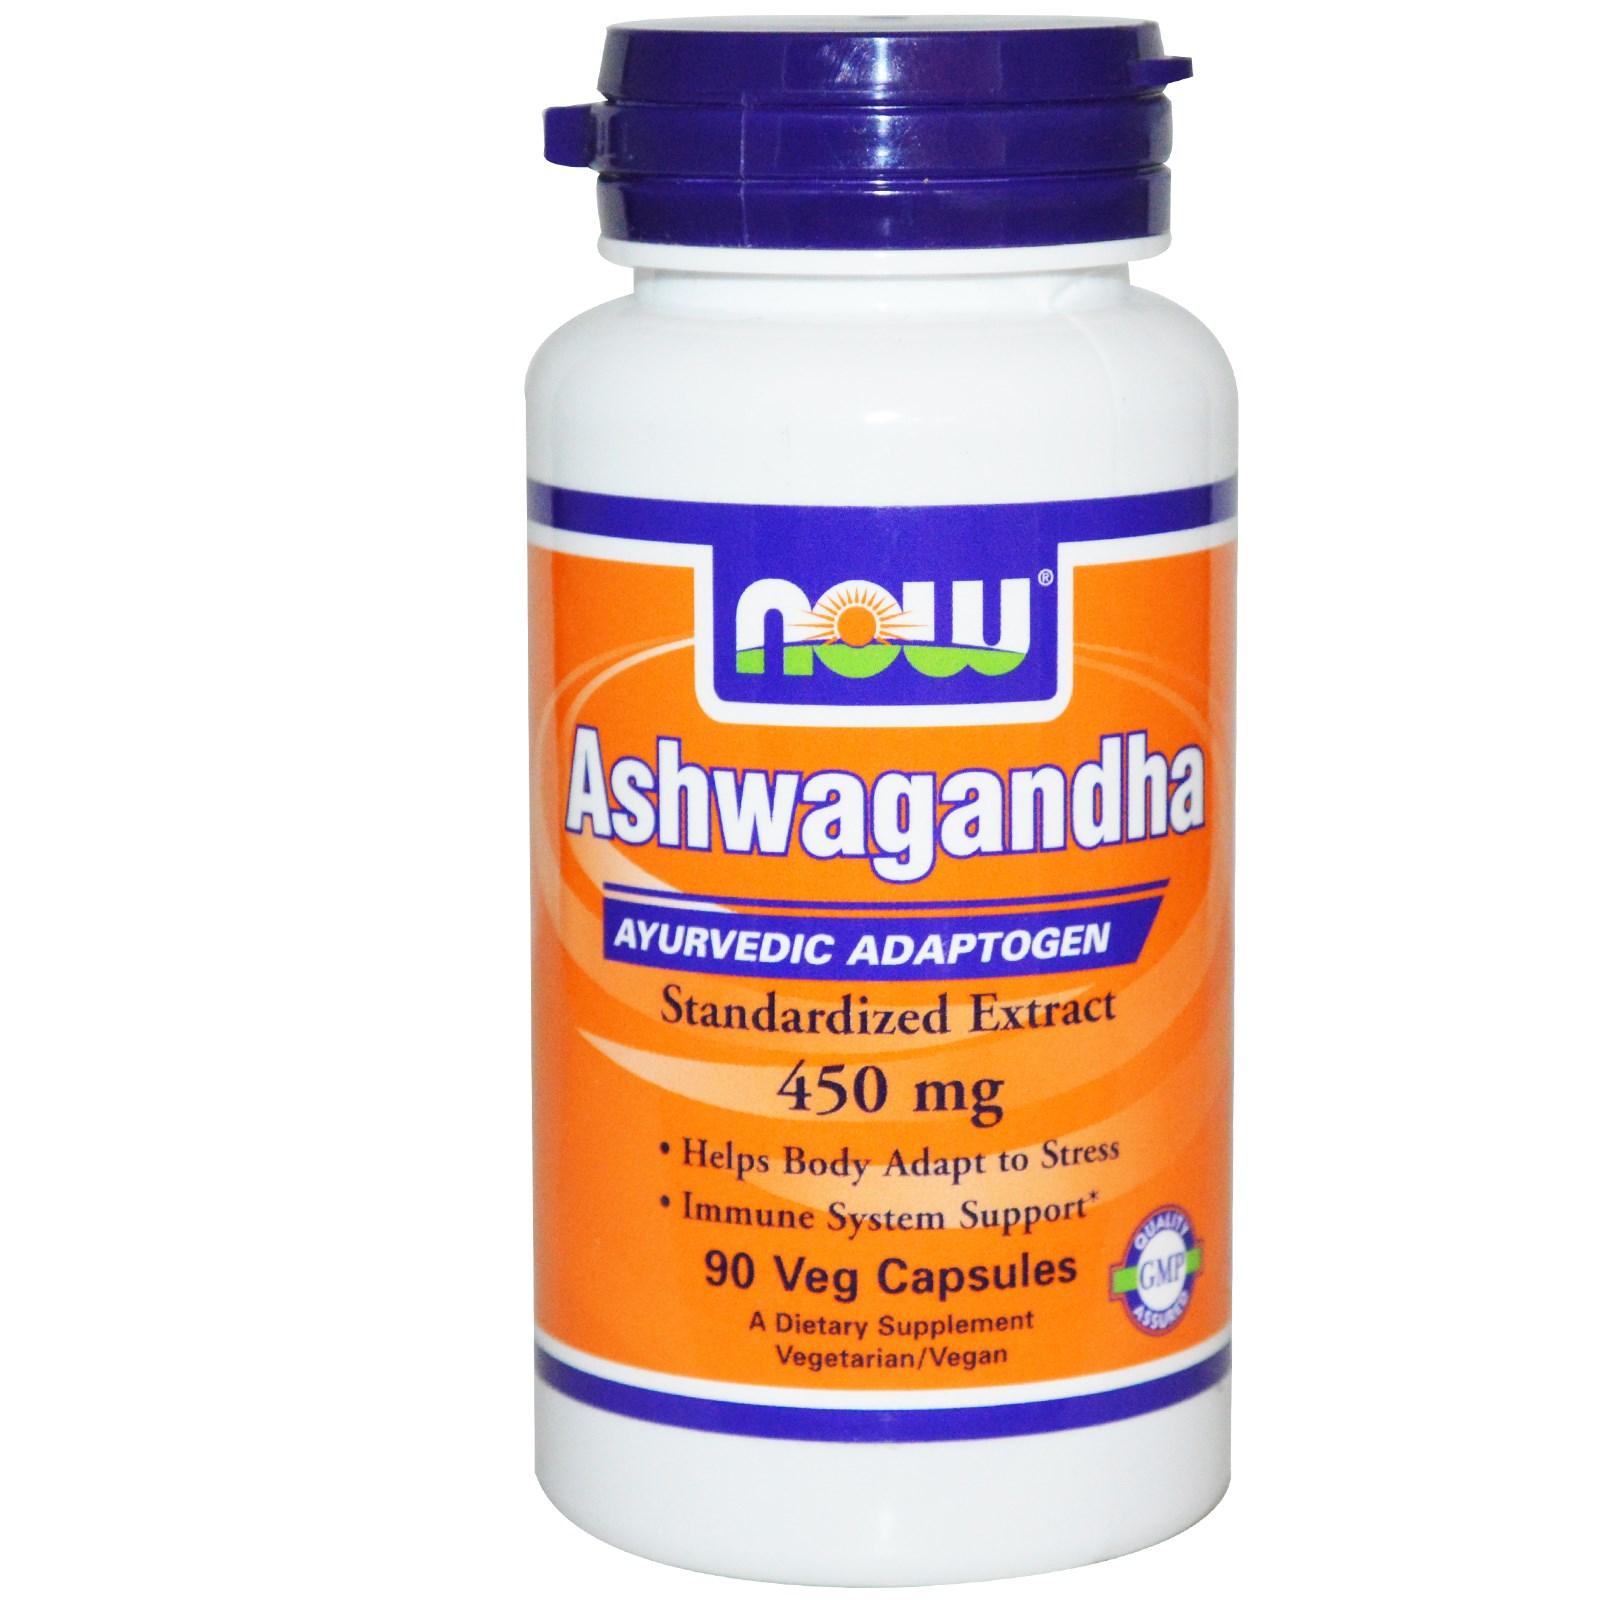 Image of Ashwagandha 450 mg (90 Veggie Caps) - Now Foods 0733739046031